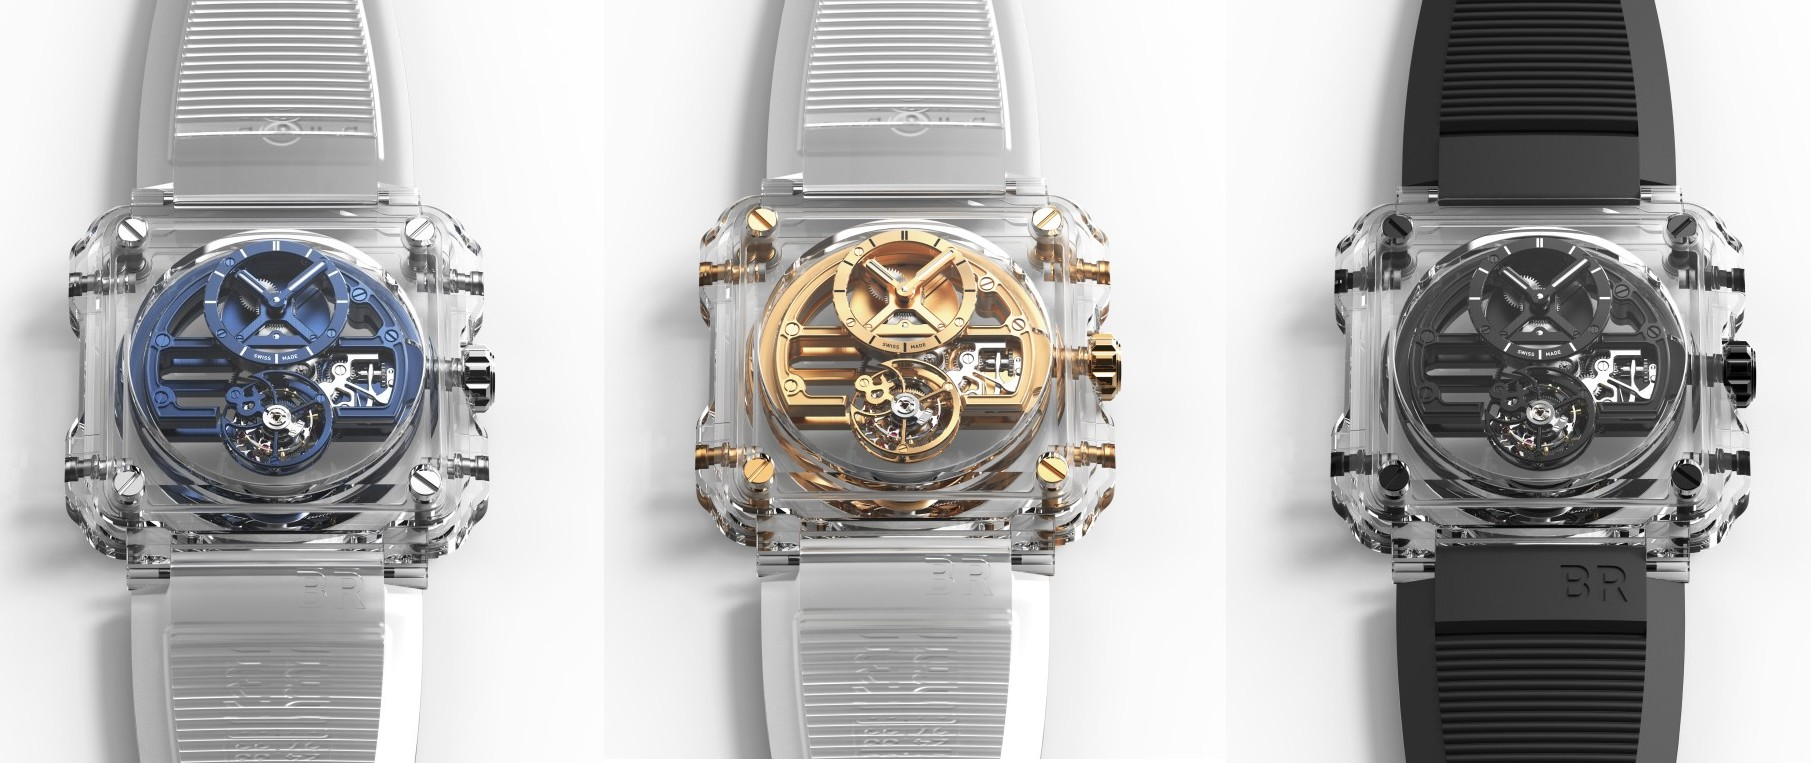 極致透明的獨一無二珍品: Bell & Ross BR-X1 Skeleton Tourbillon Sapphire